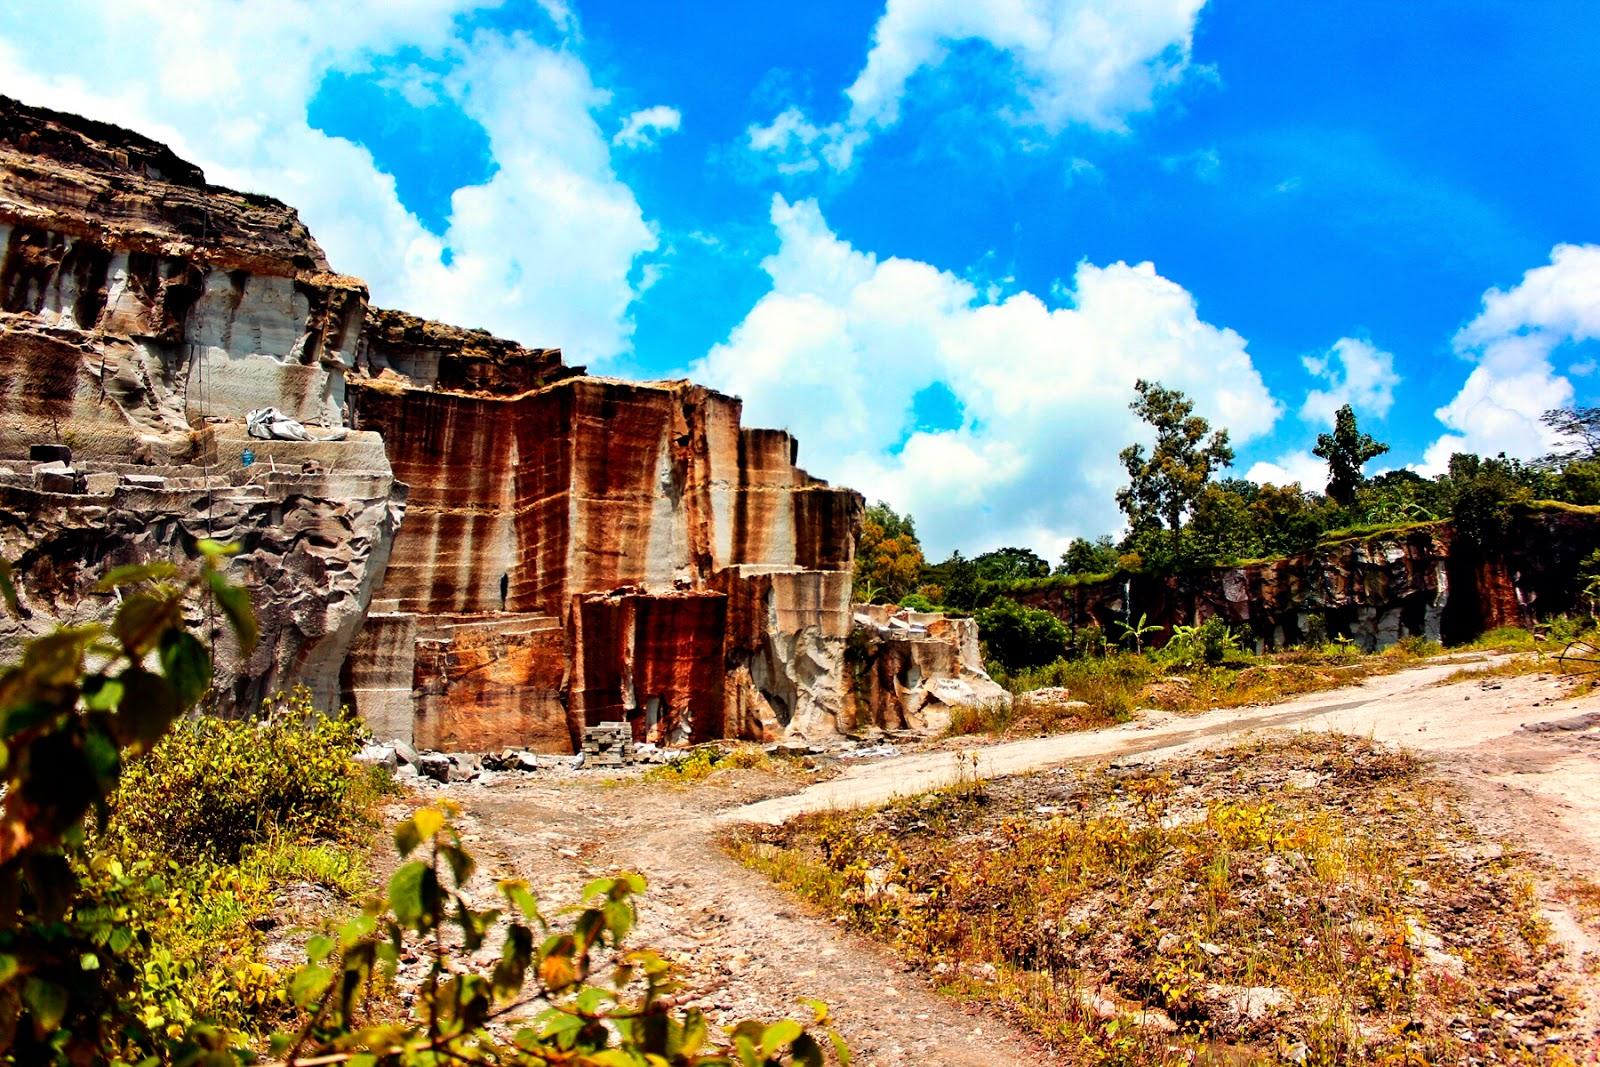 Tempat Tempat Wisata Daerah Yogyakarta Dan Sekitarnya Tebing Breksi Yogyakarta